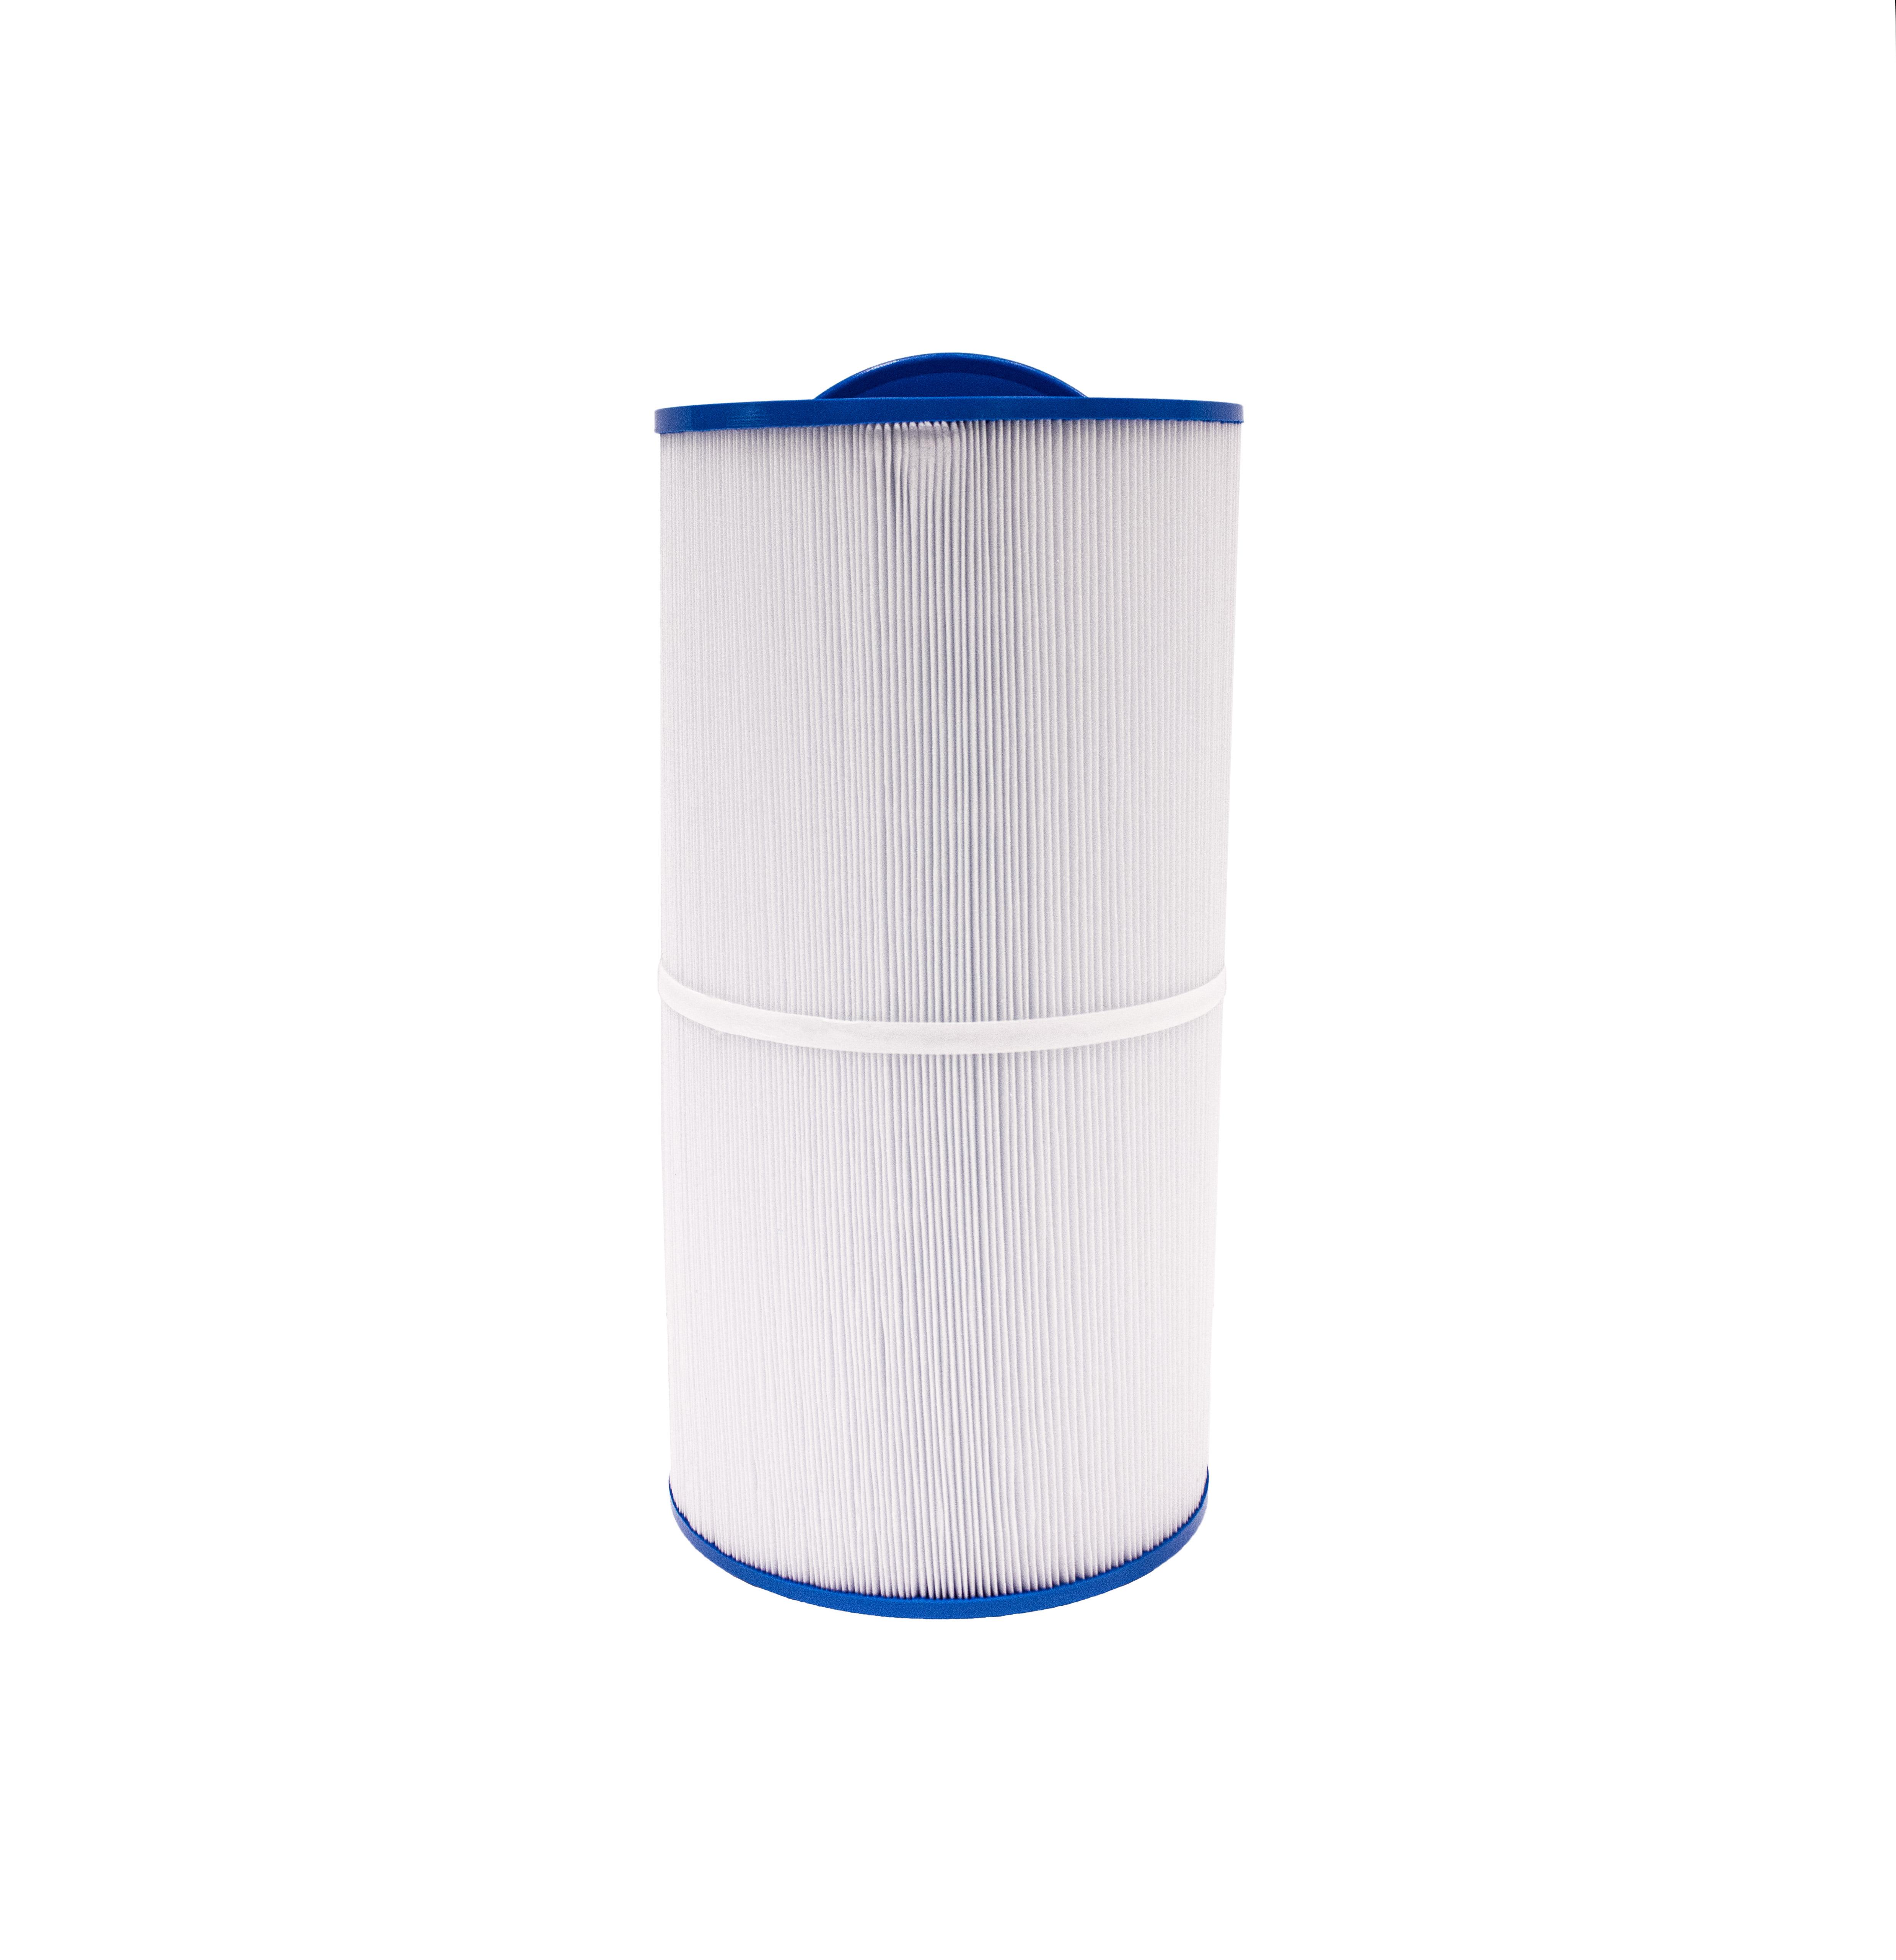 Jacuzzi filter 2450-381 (400-serien)